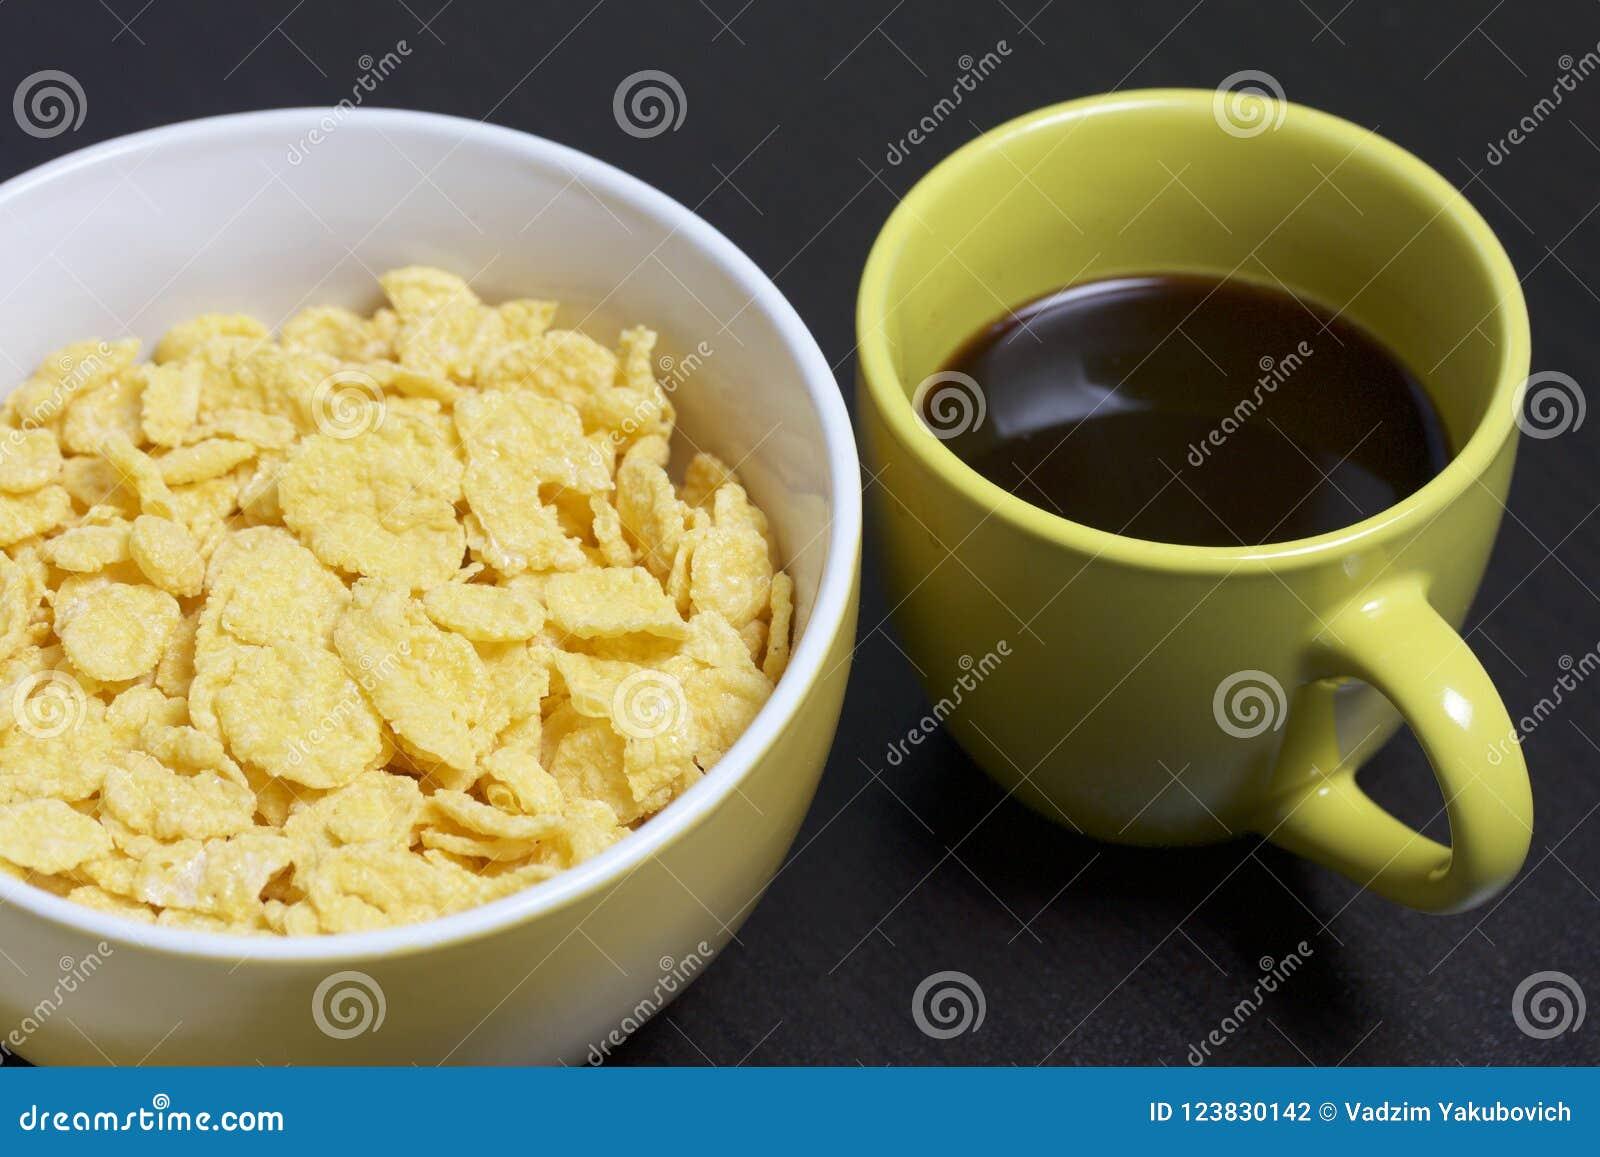 Why is coffee useful